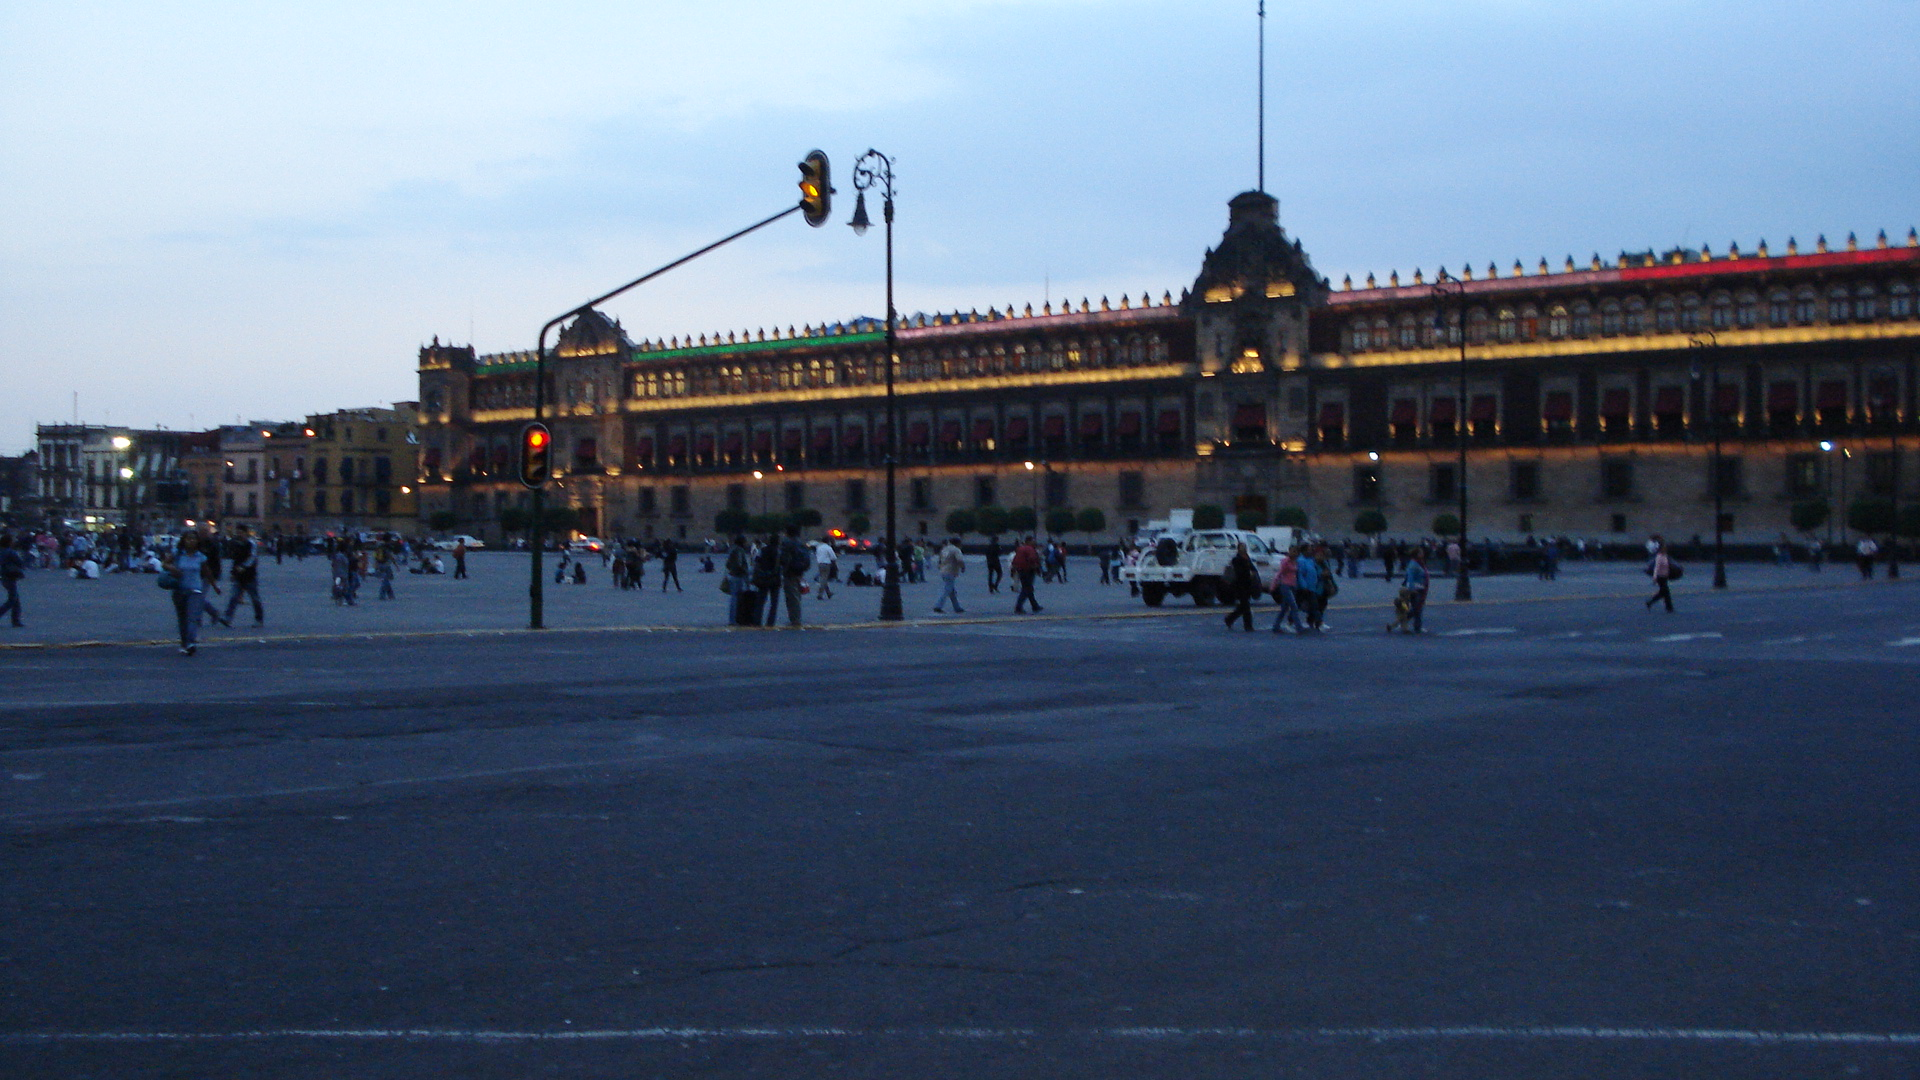 File:Zocalo de México.JPG - Wikimedia Commons